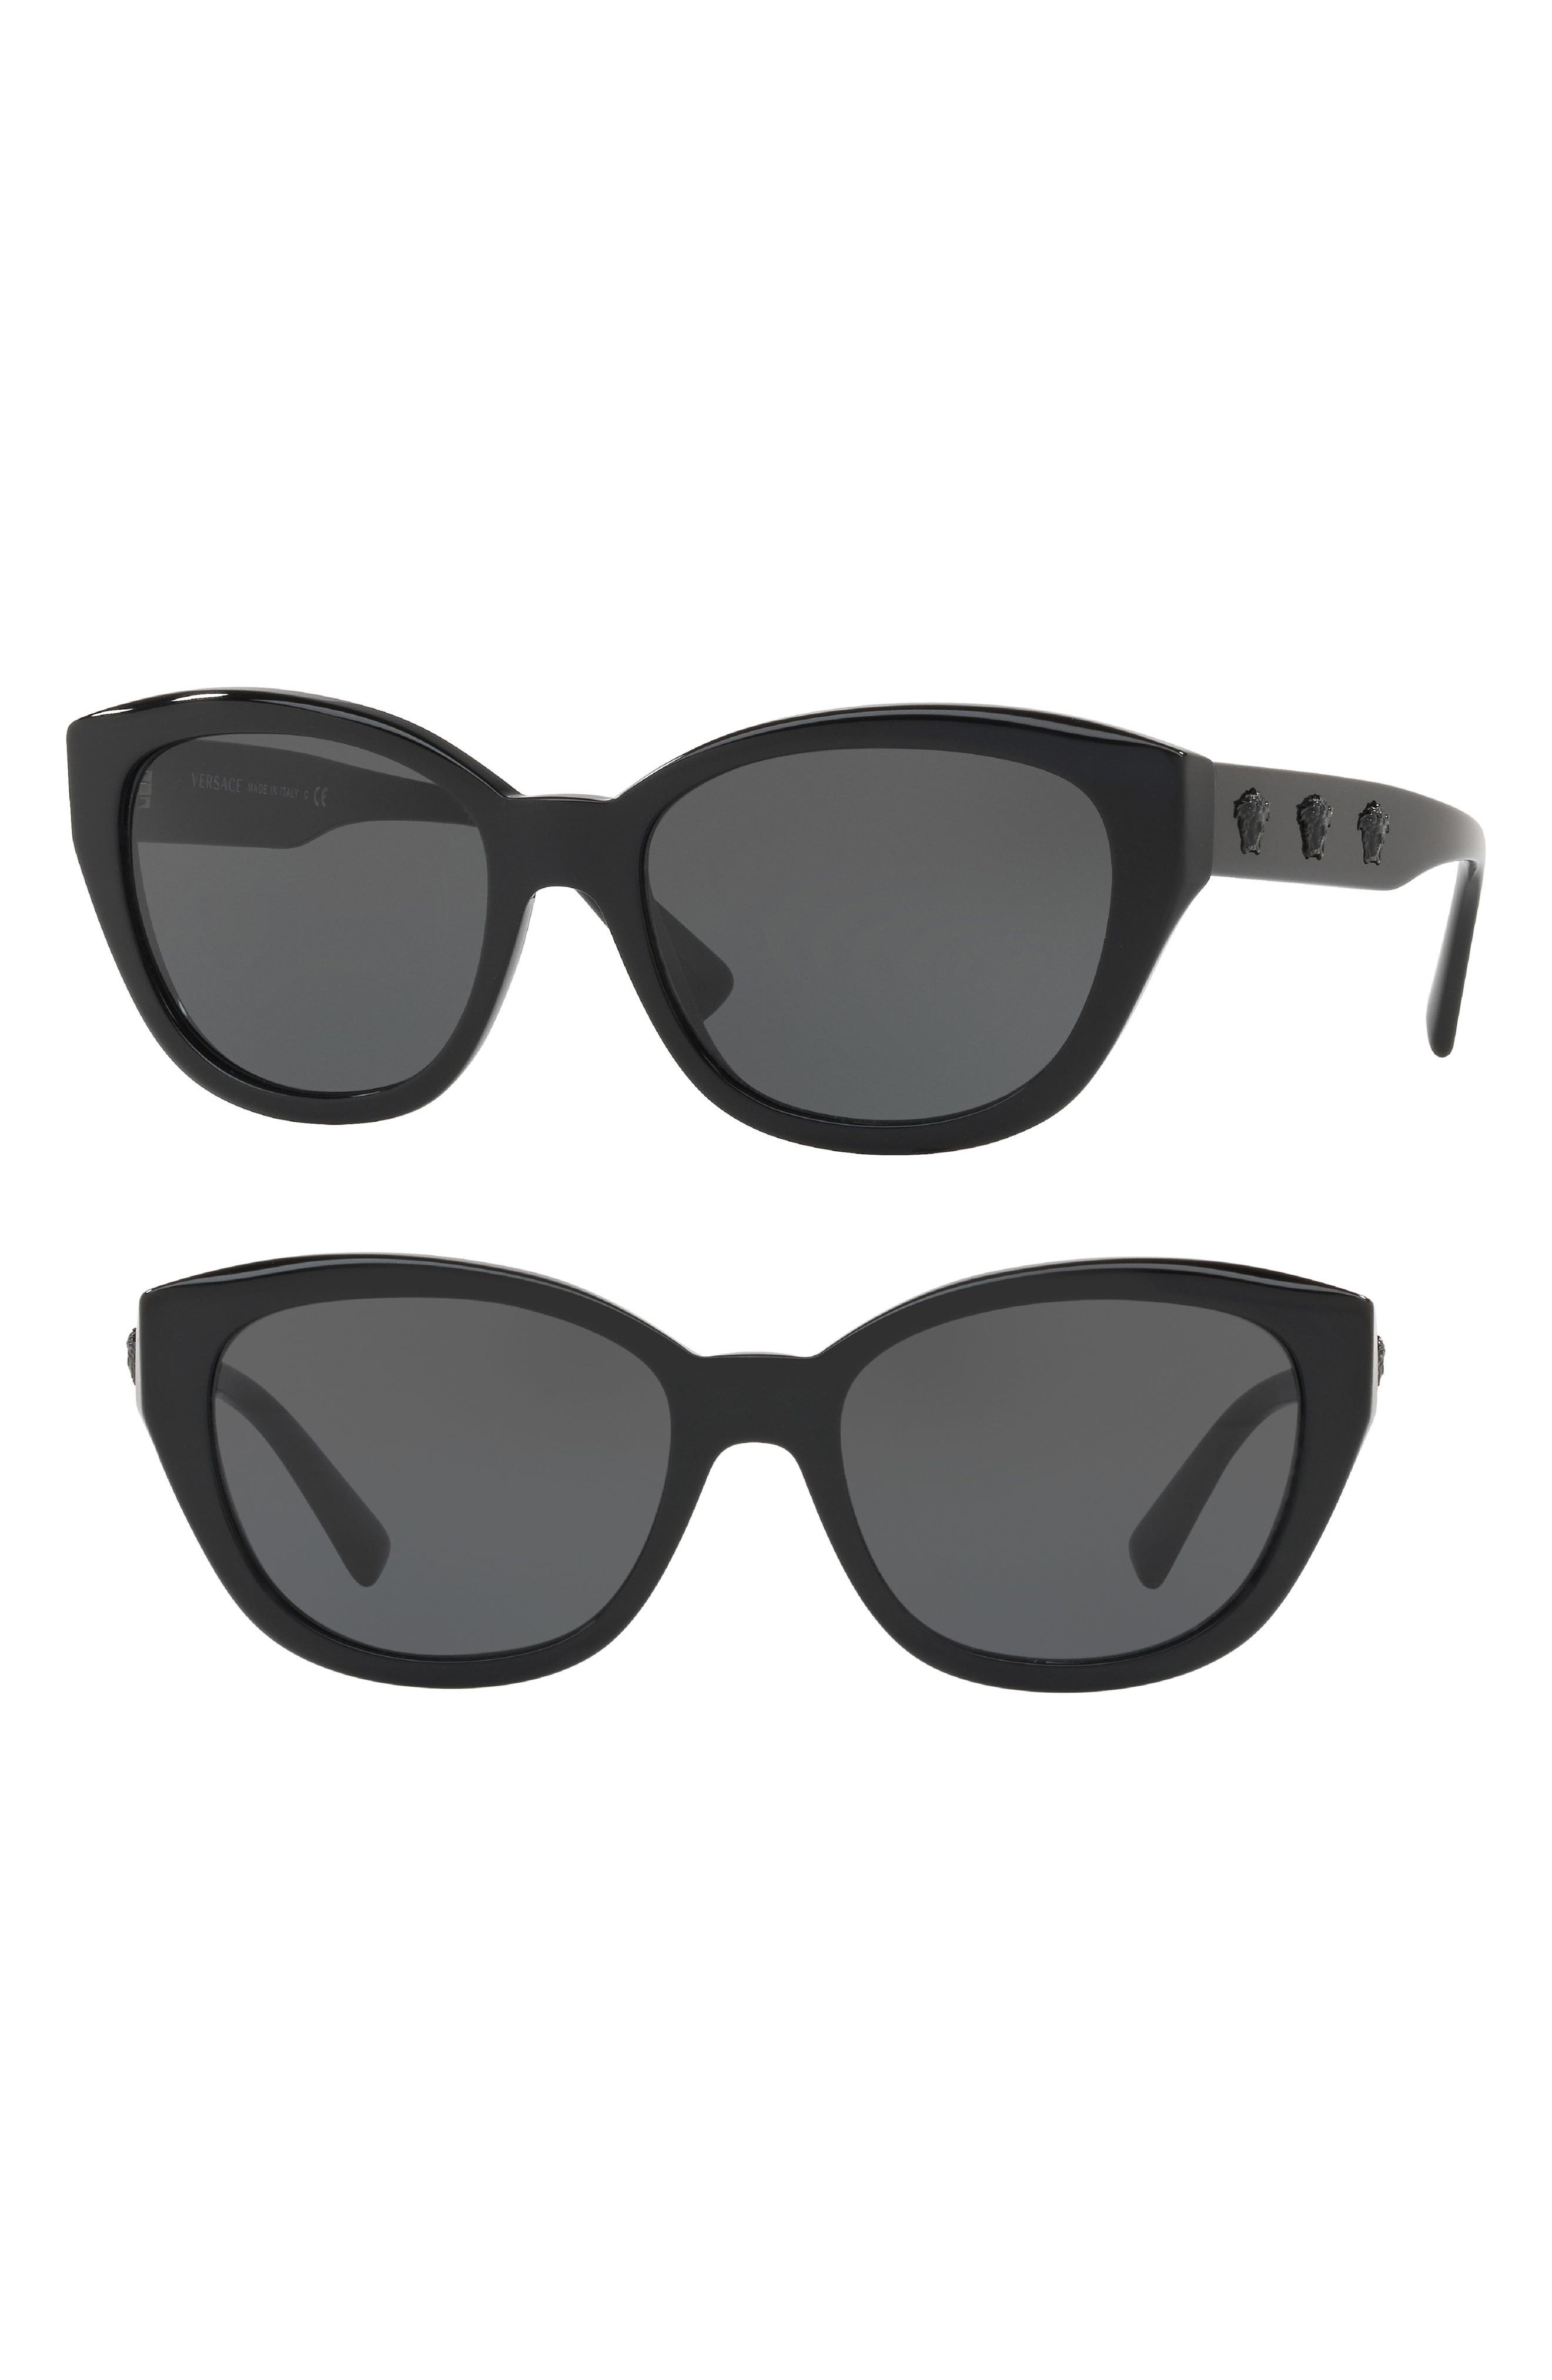 Versace Sunglasses 56MM CAT EYE SUNGLASSES - BLACK/ GREY